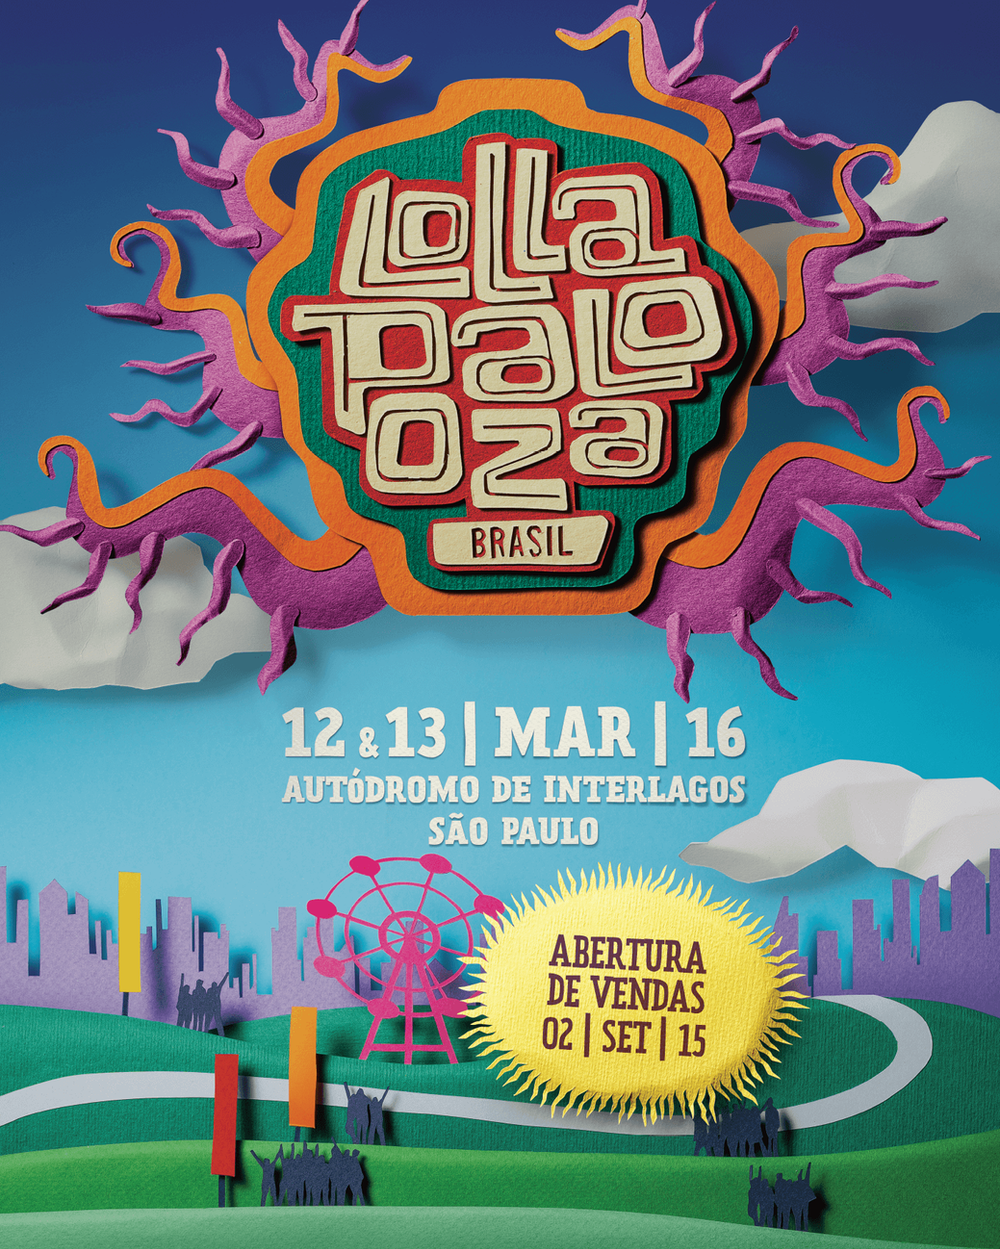 Lollapalooza Brasil 2016 AD